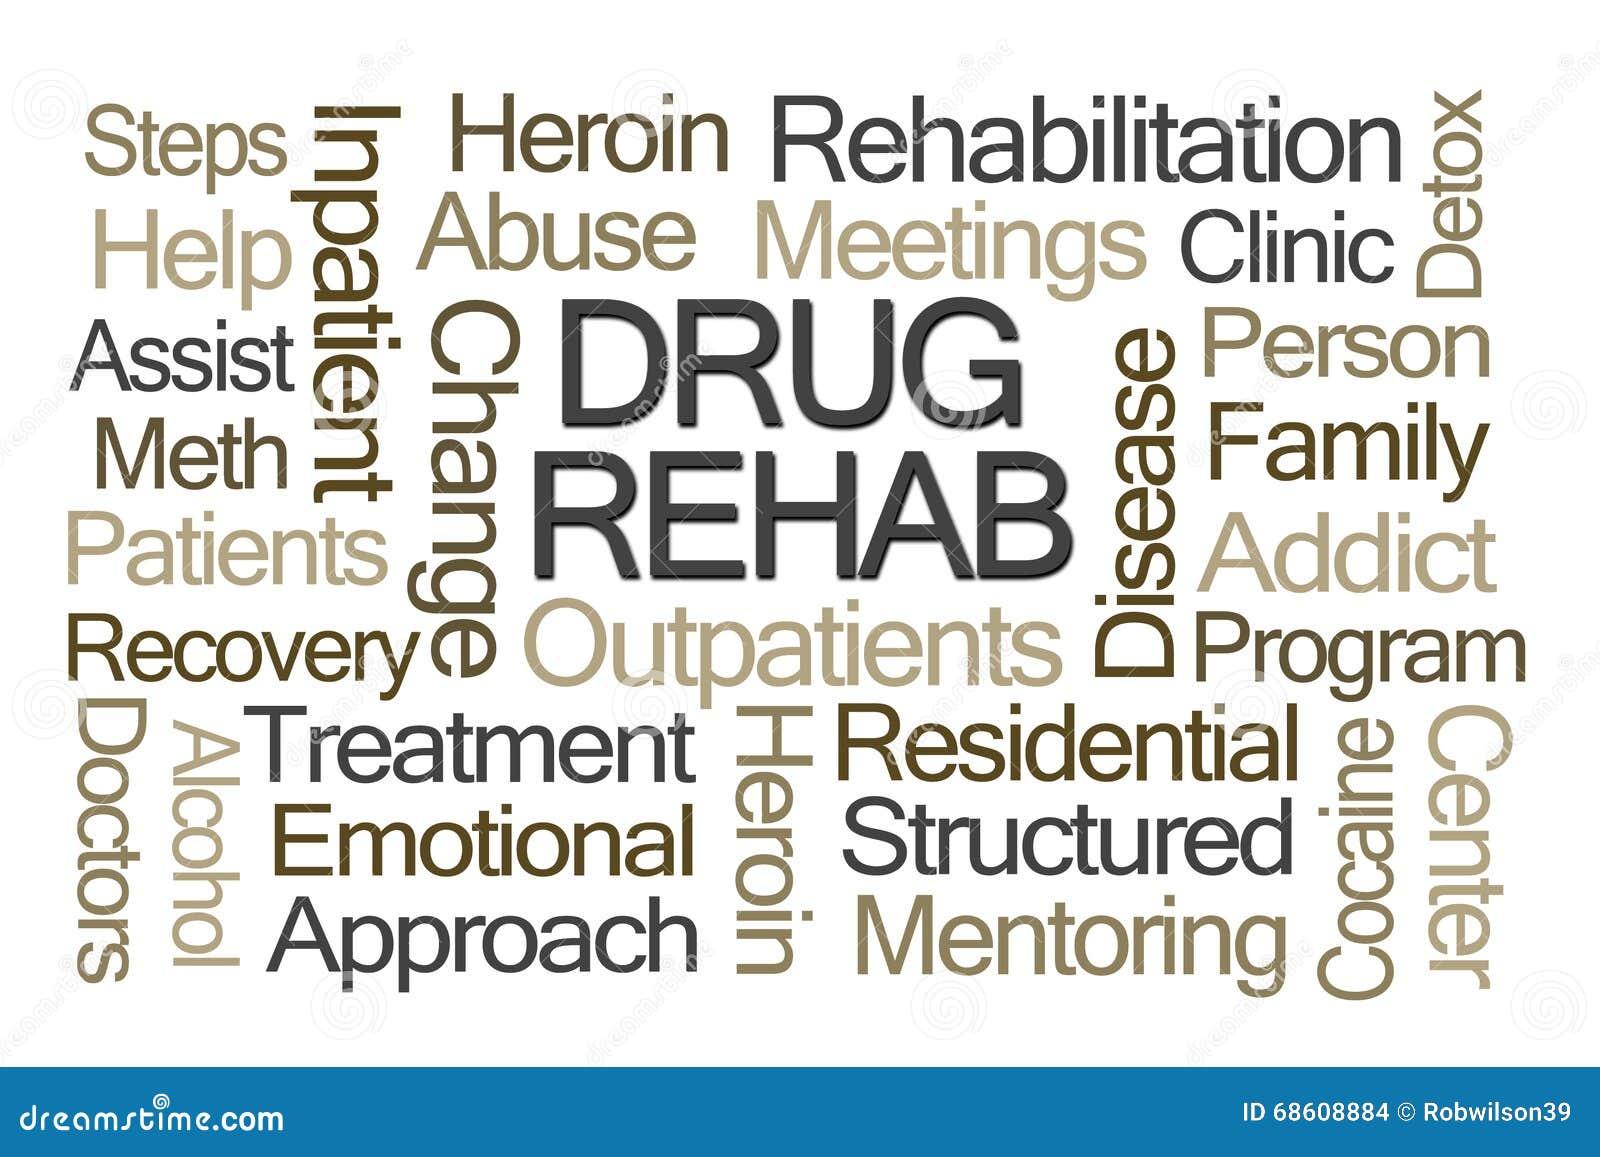 Charmant Drogenmissbrauch Politik Vorlage Bilder - Entry Level ...